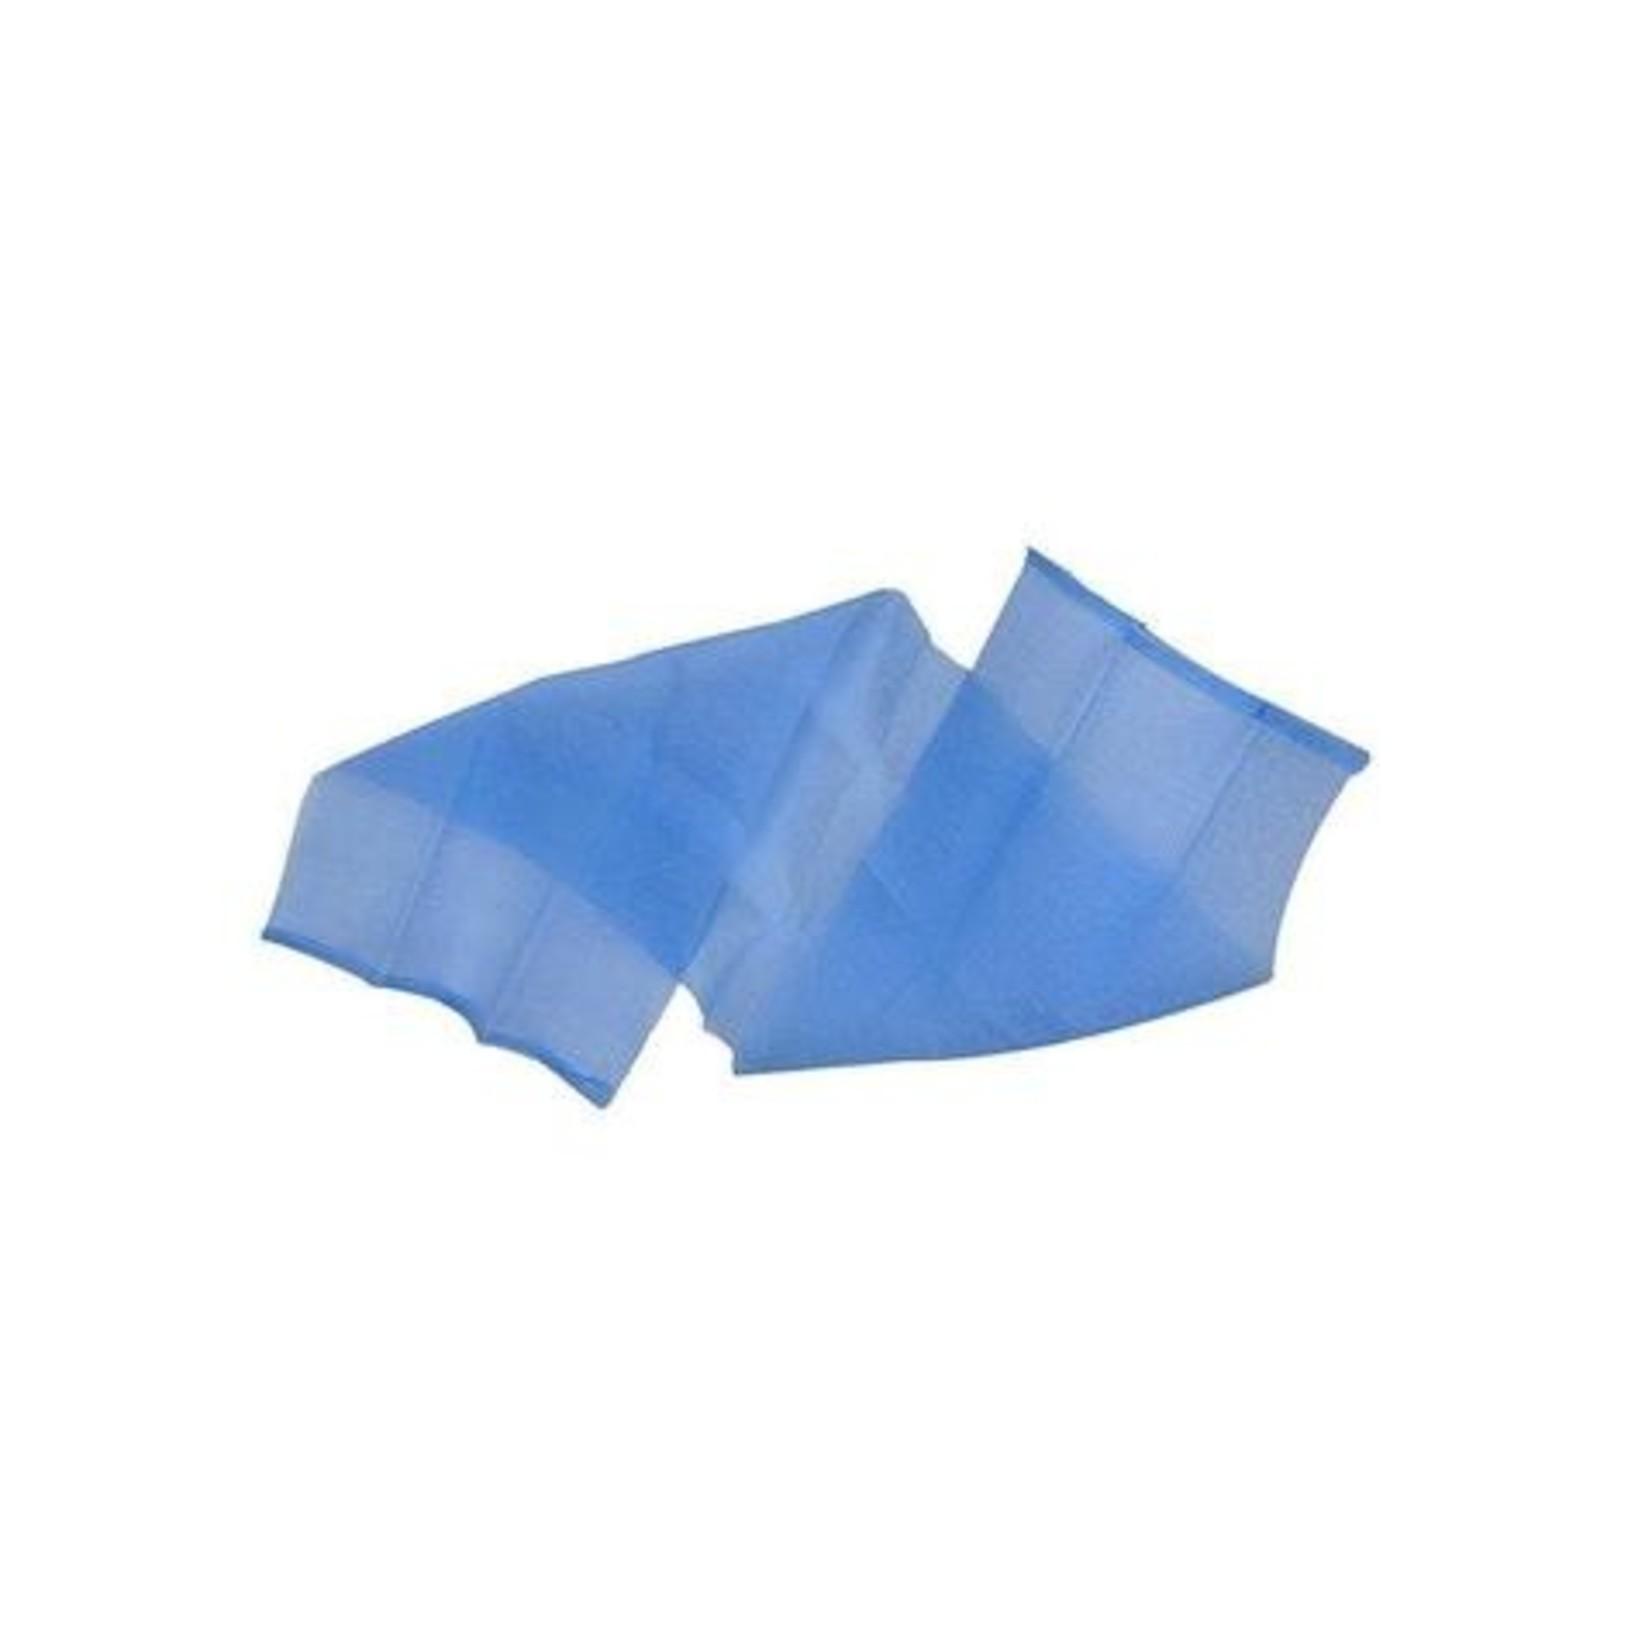 Bass Bass Body Care Exfoliation Skin Towel